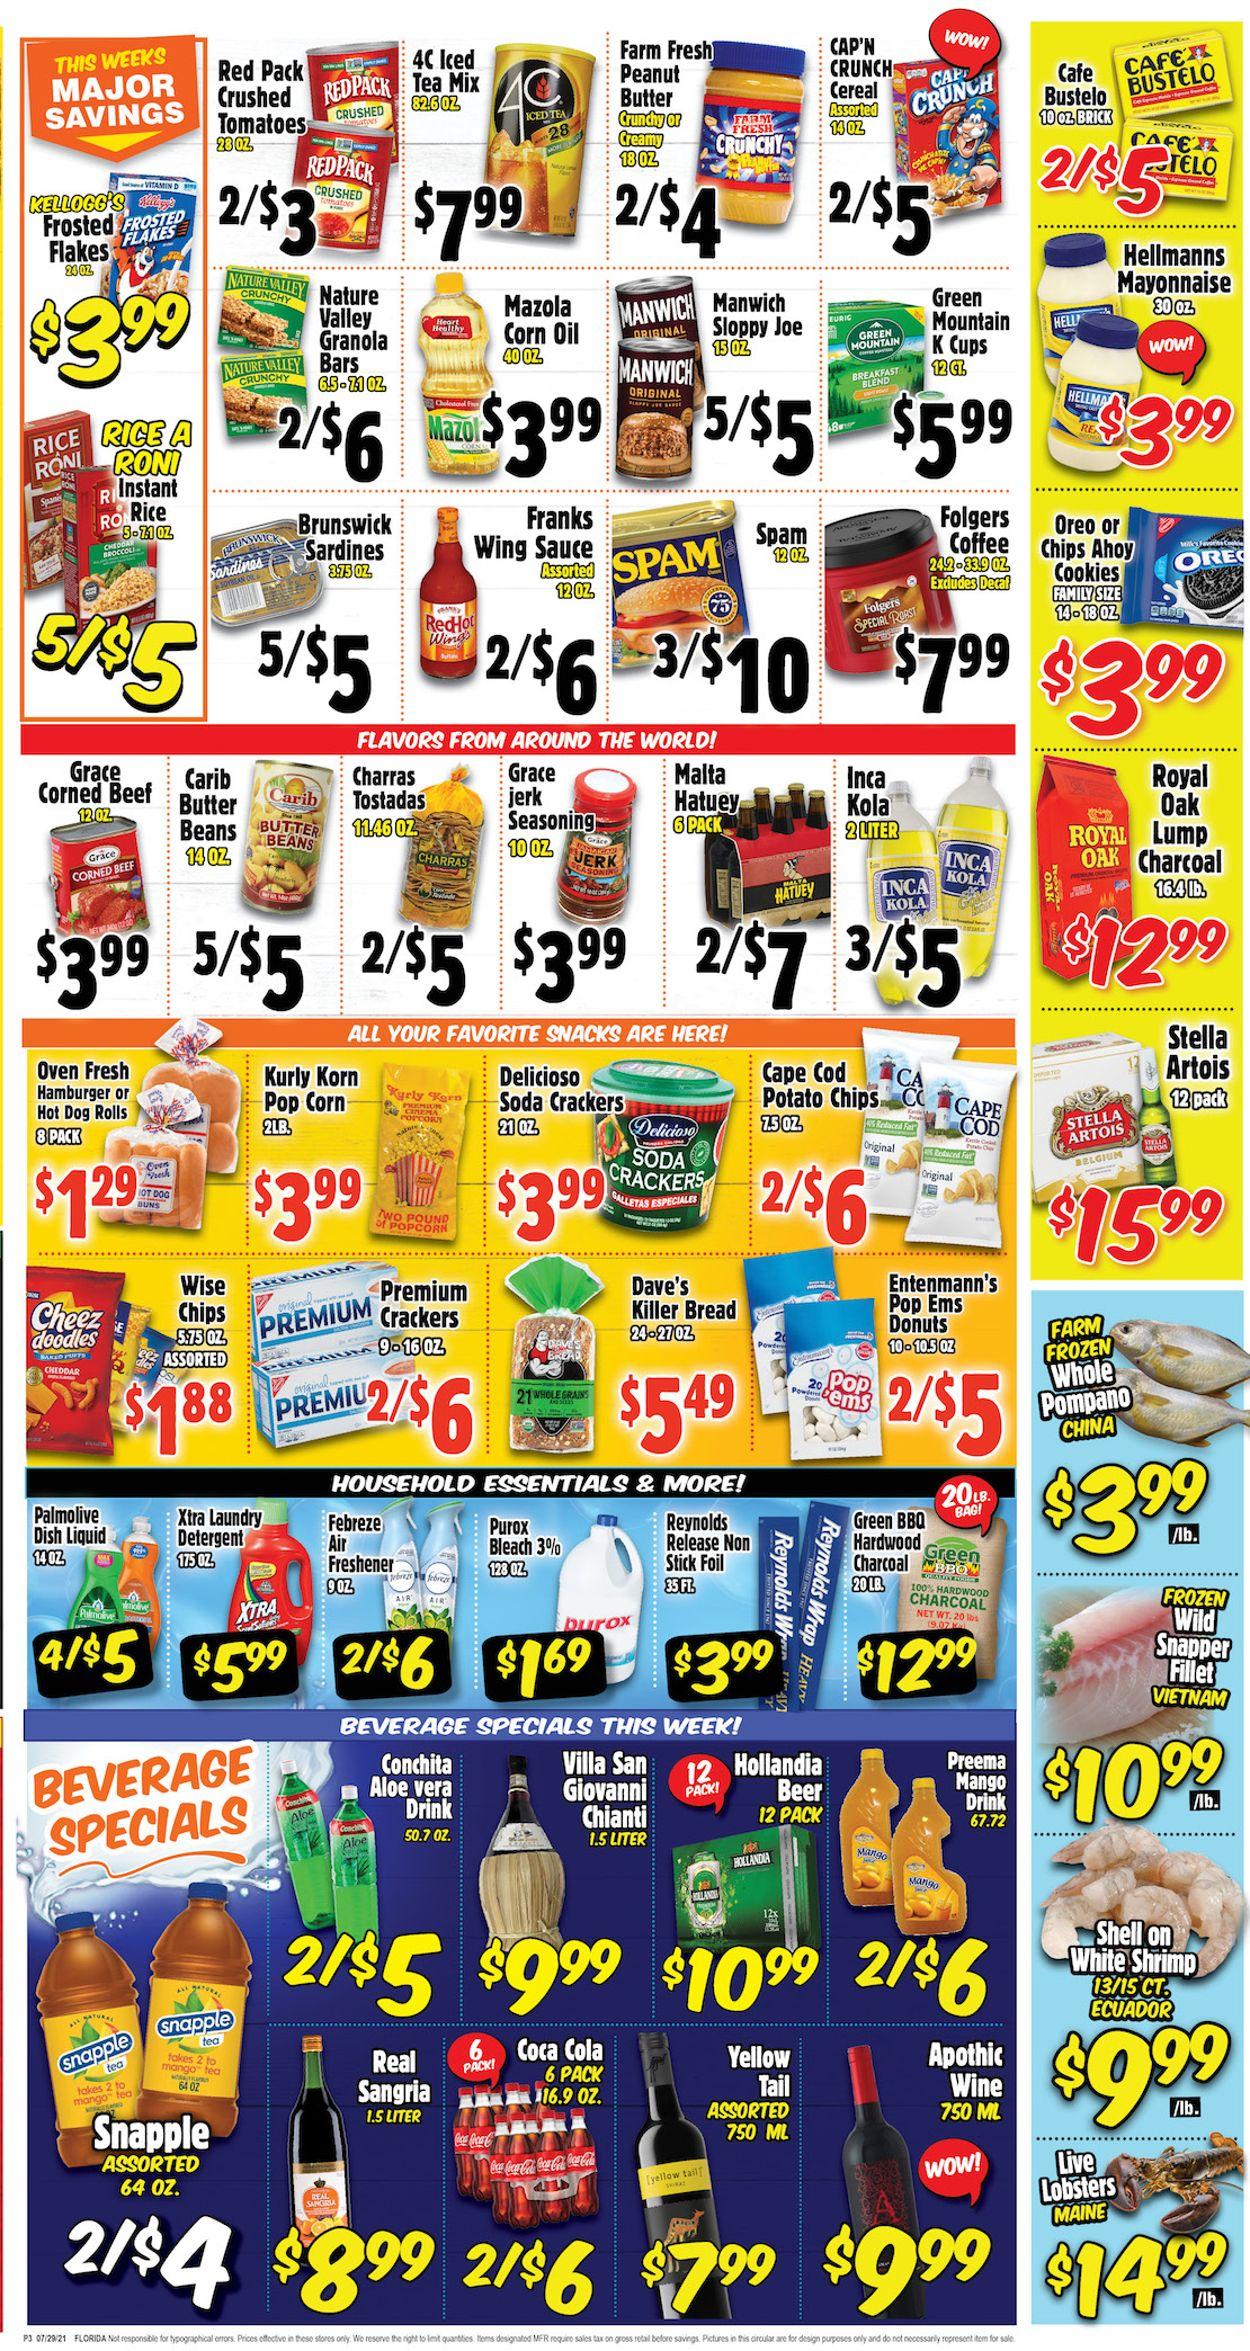 Western Beef Weekly Ad Circular - valid 07/28-08/03/2021 (Page 4)